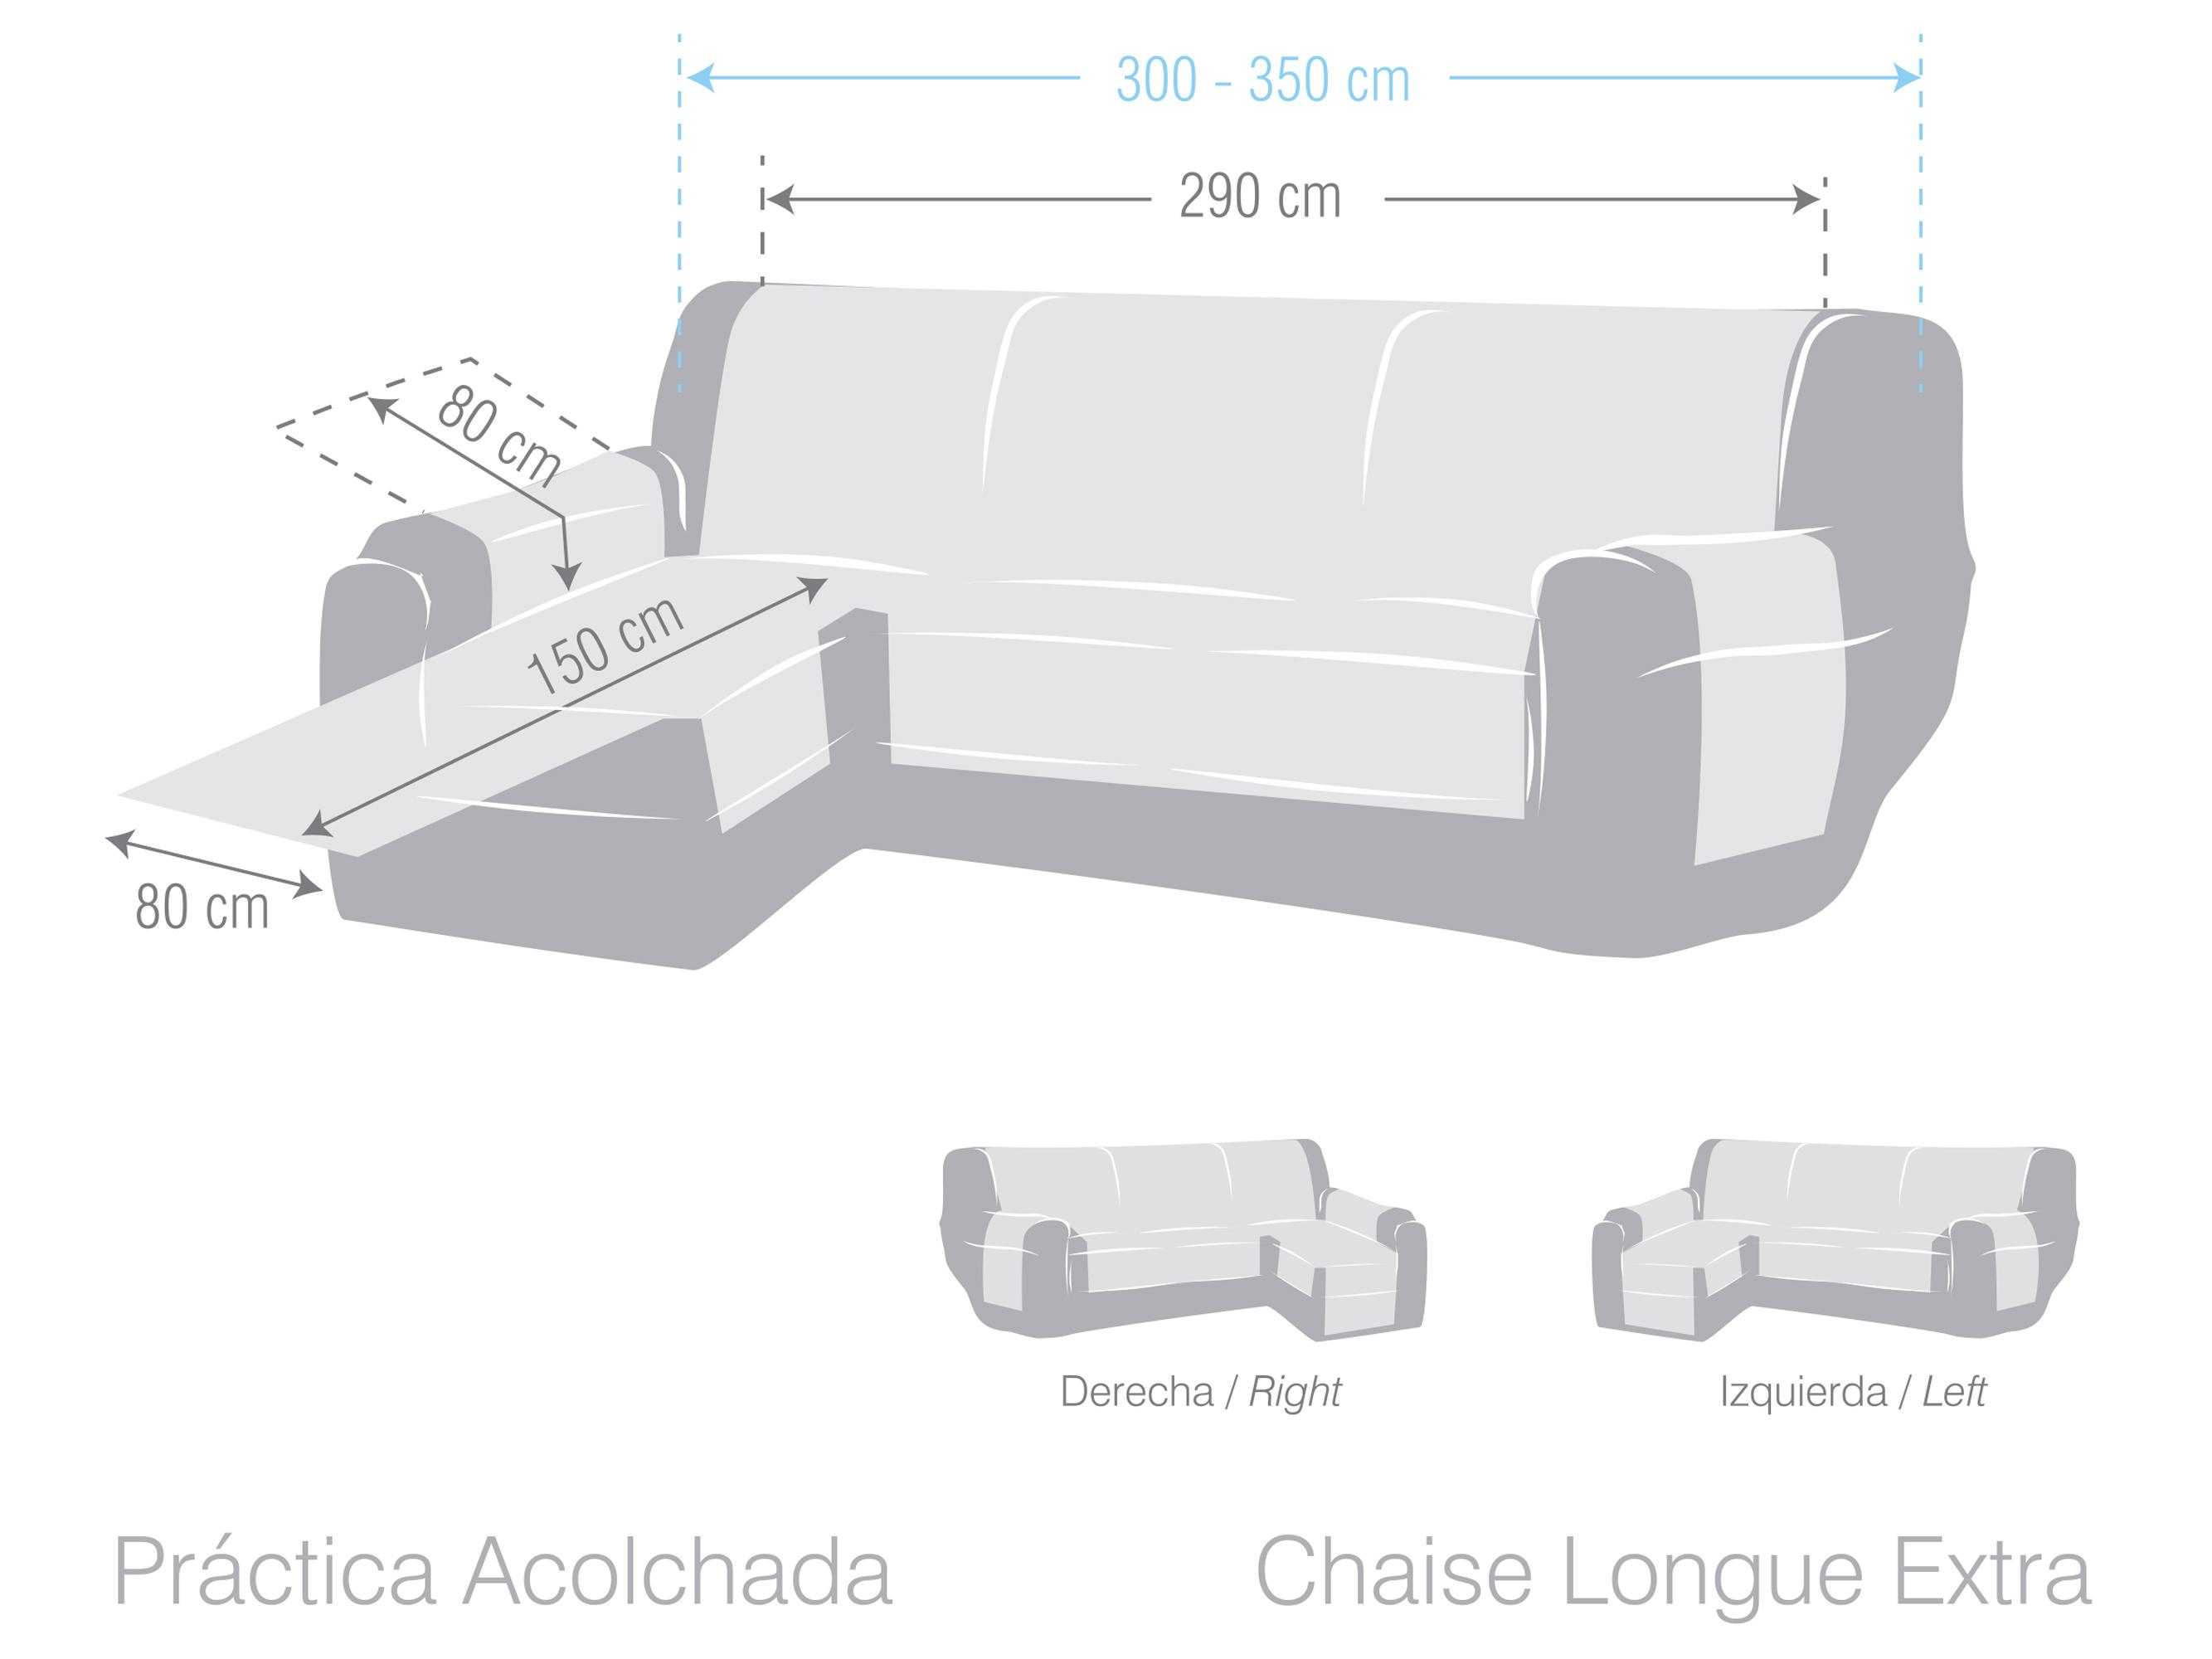 F_PRACTICA-ACOLCHADA-CHL--EXTRA.jpg